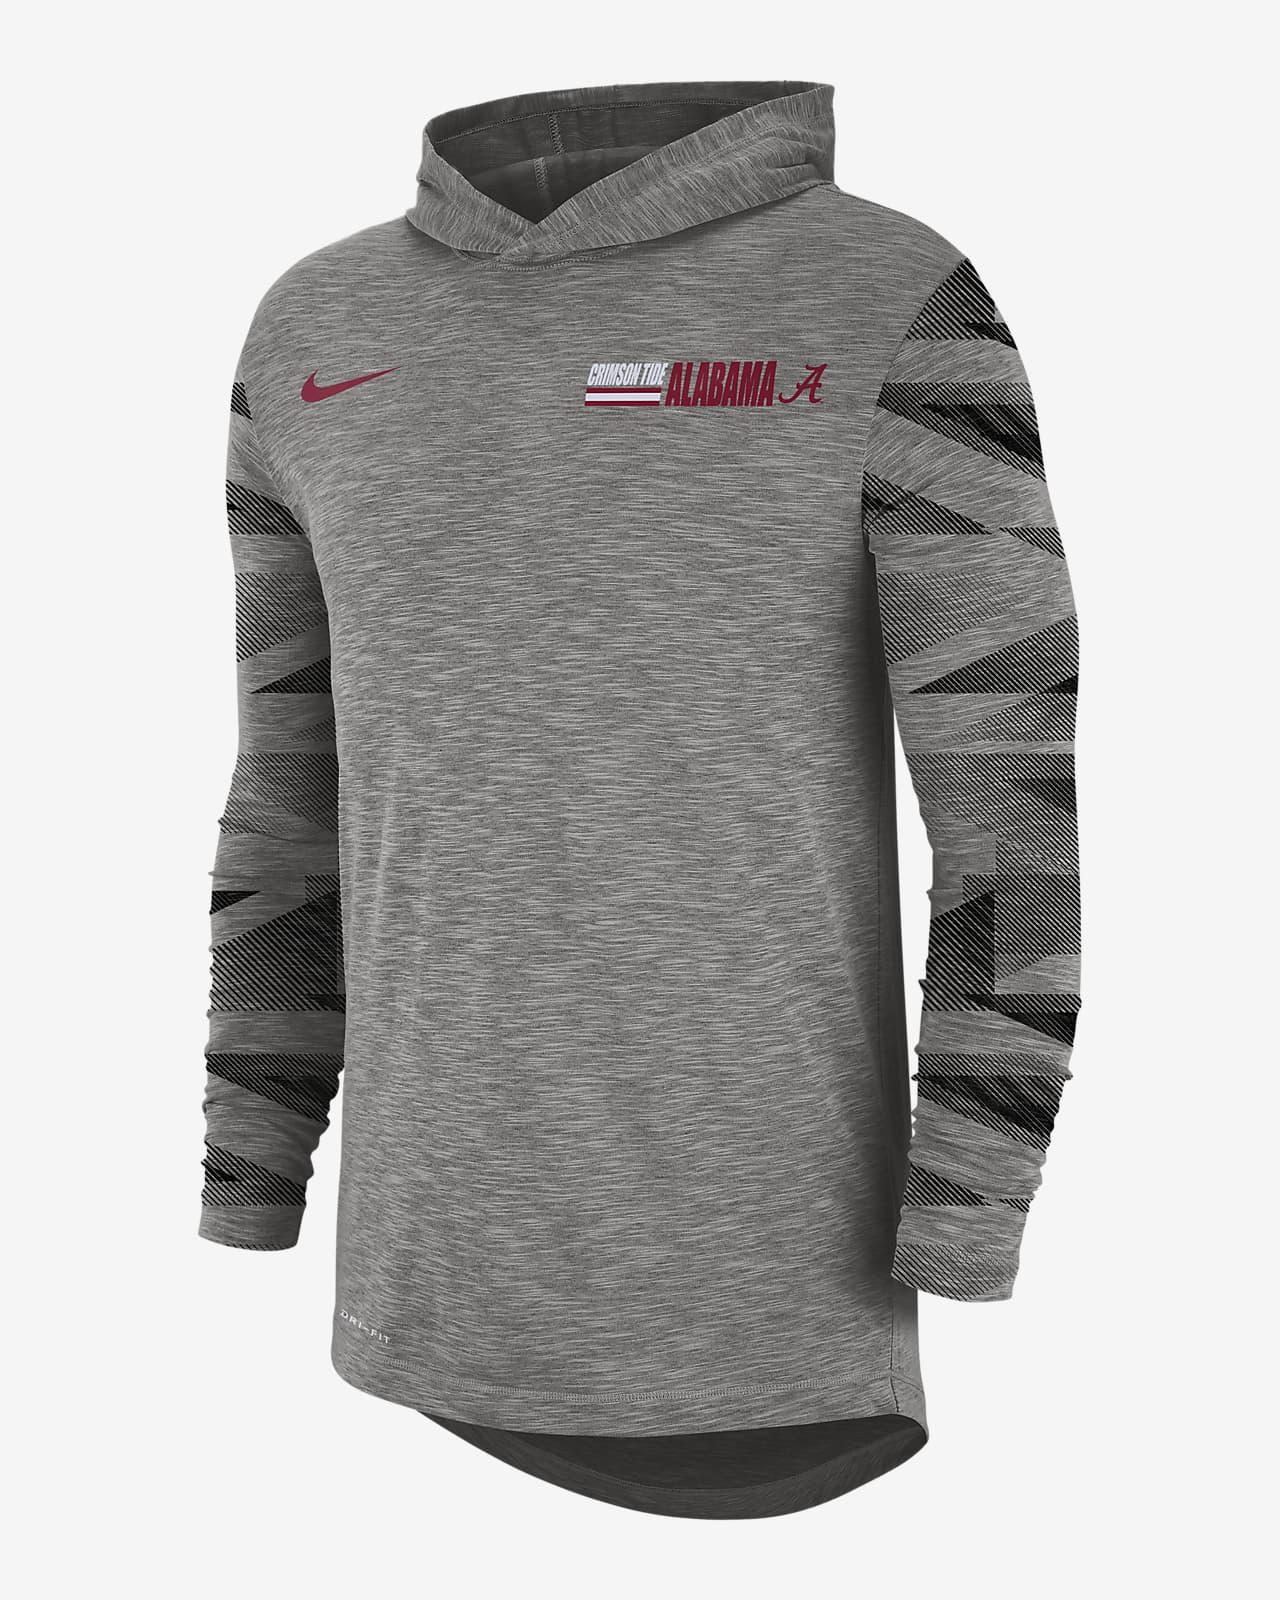 Men's Long-Sleeve Hooded T-Shirt. Nike.com